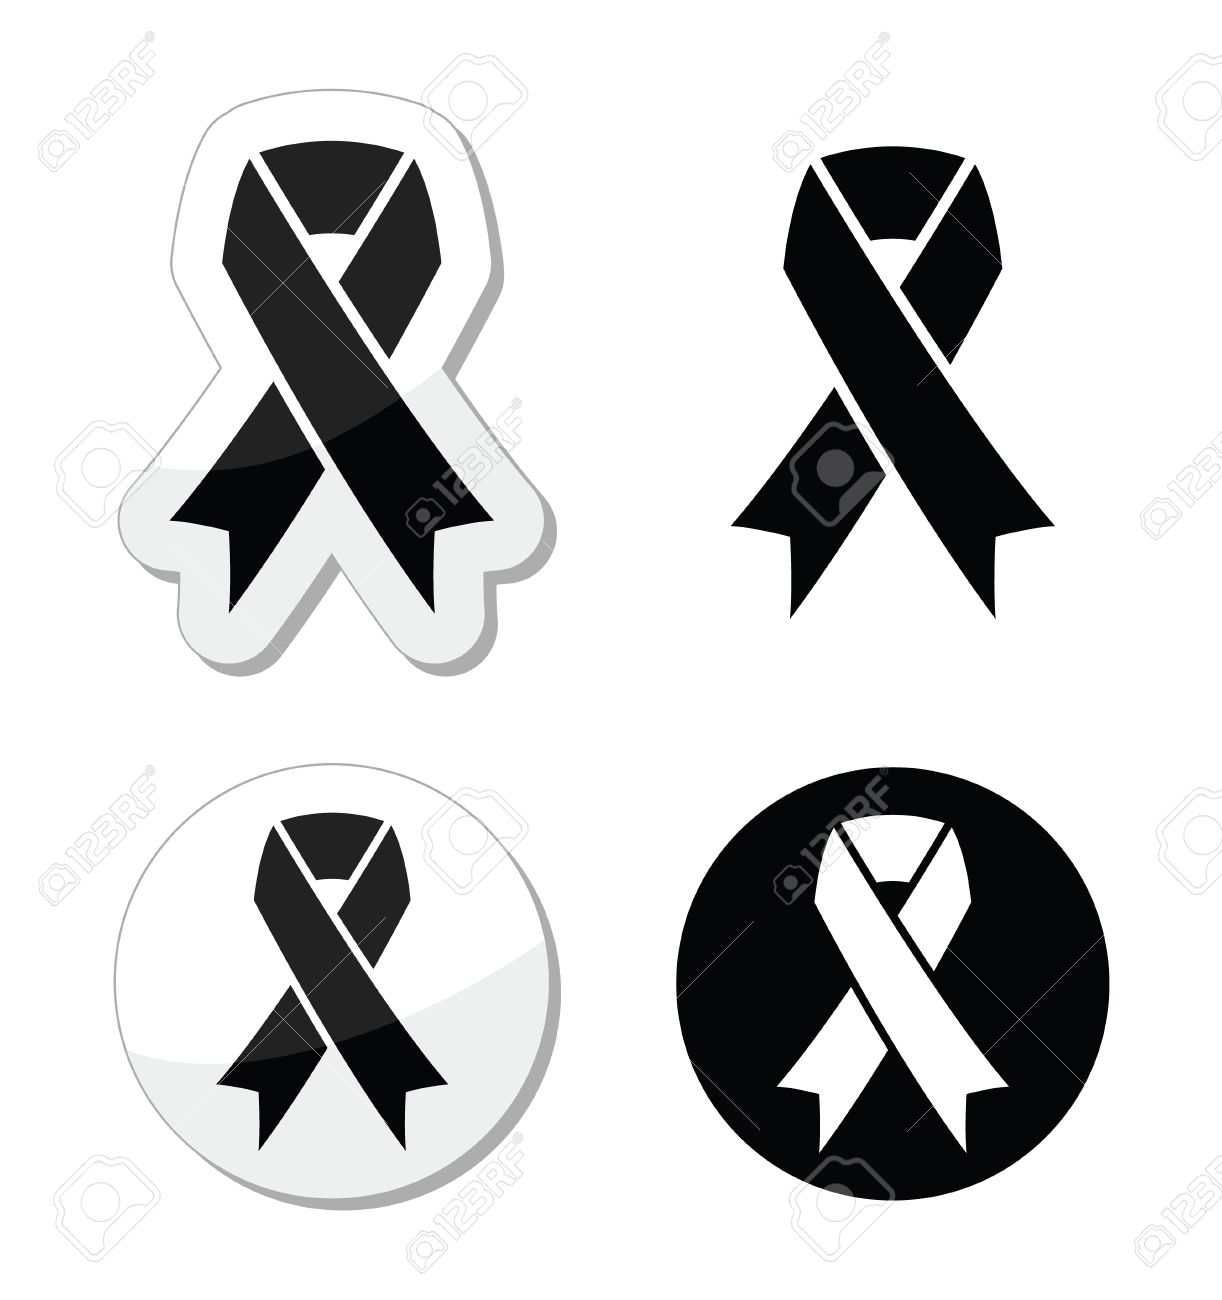 Black ribbon - mourning, death, melanoma symbol Stock Vector - 18881183